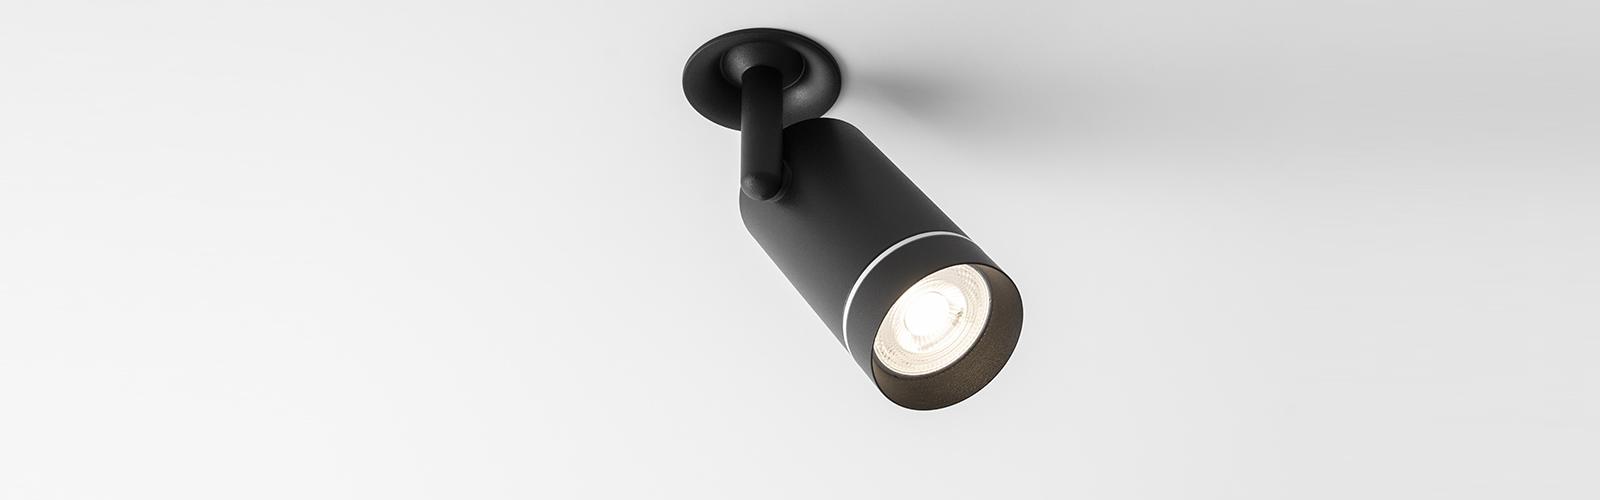 Fenos LED Lighting Recessed Adjustable Aro RA